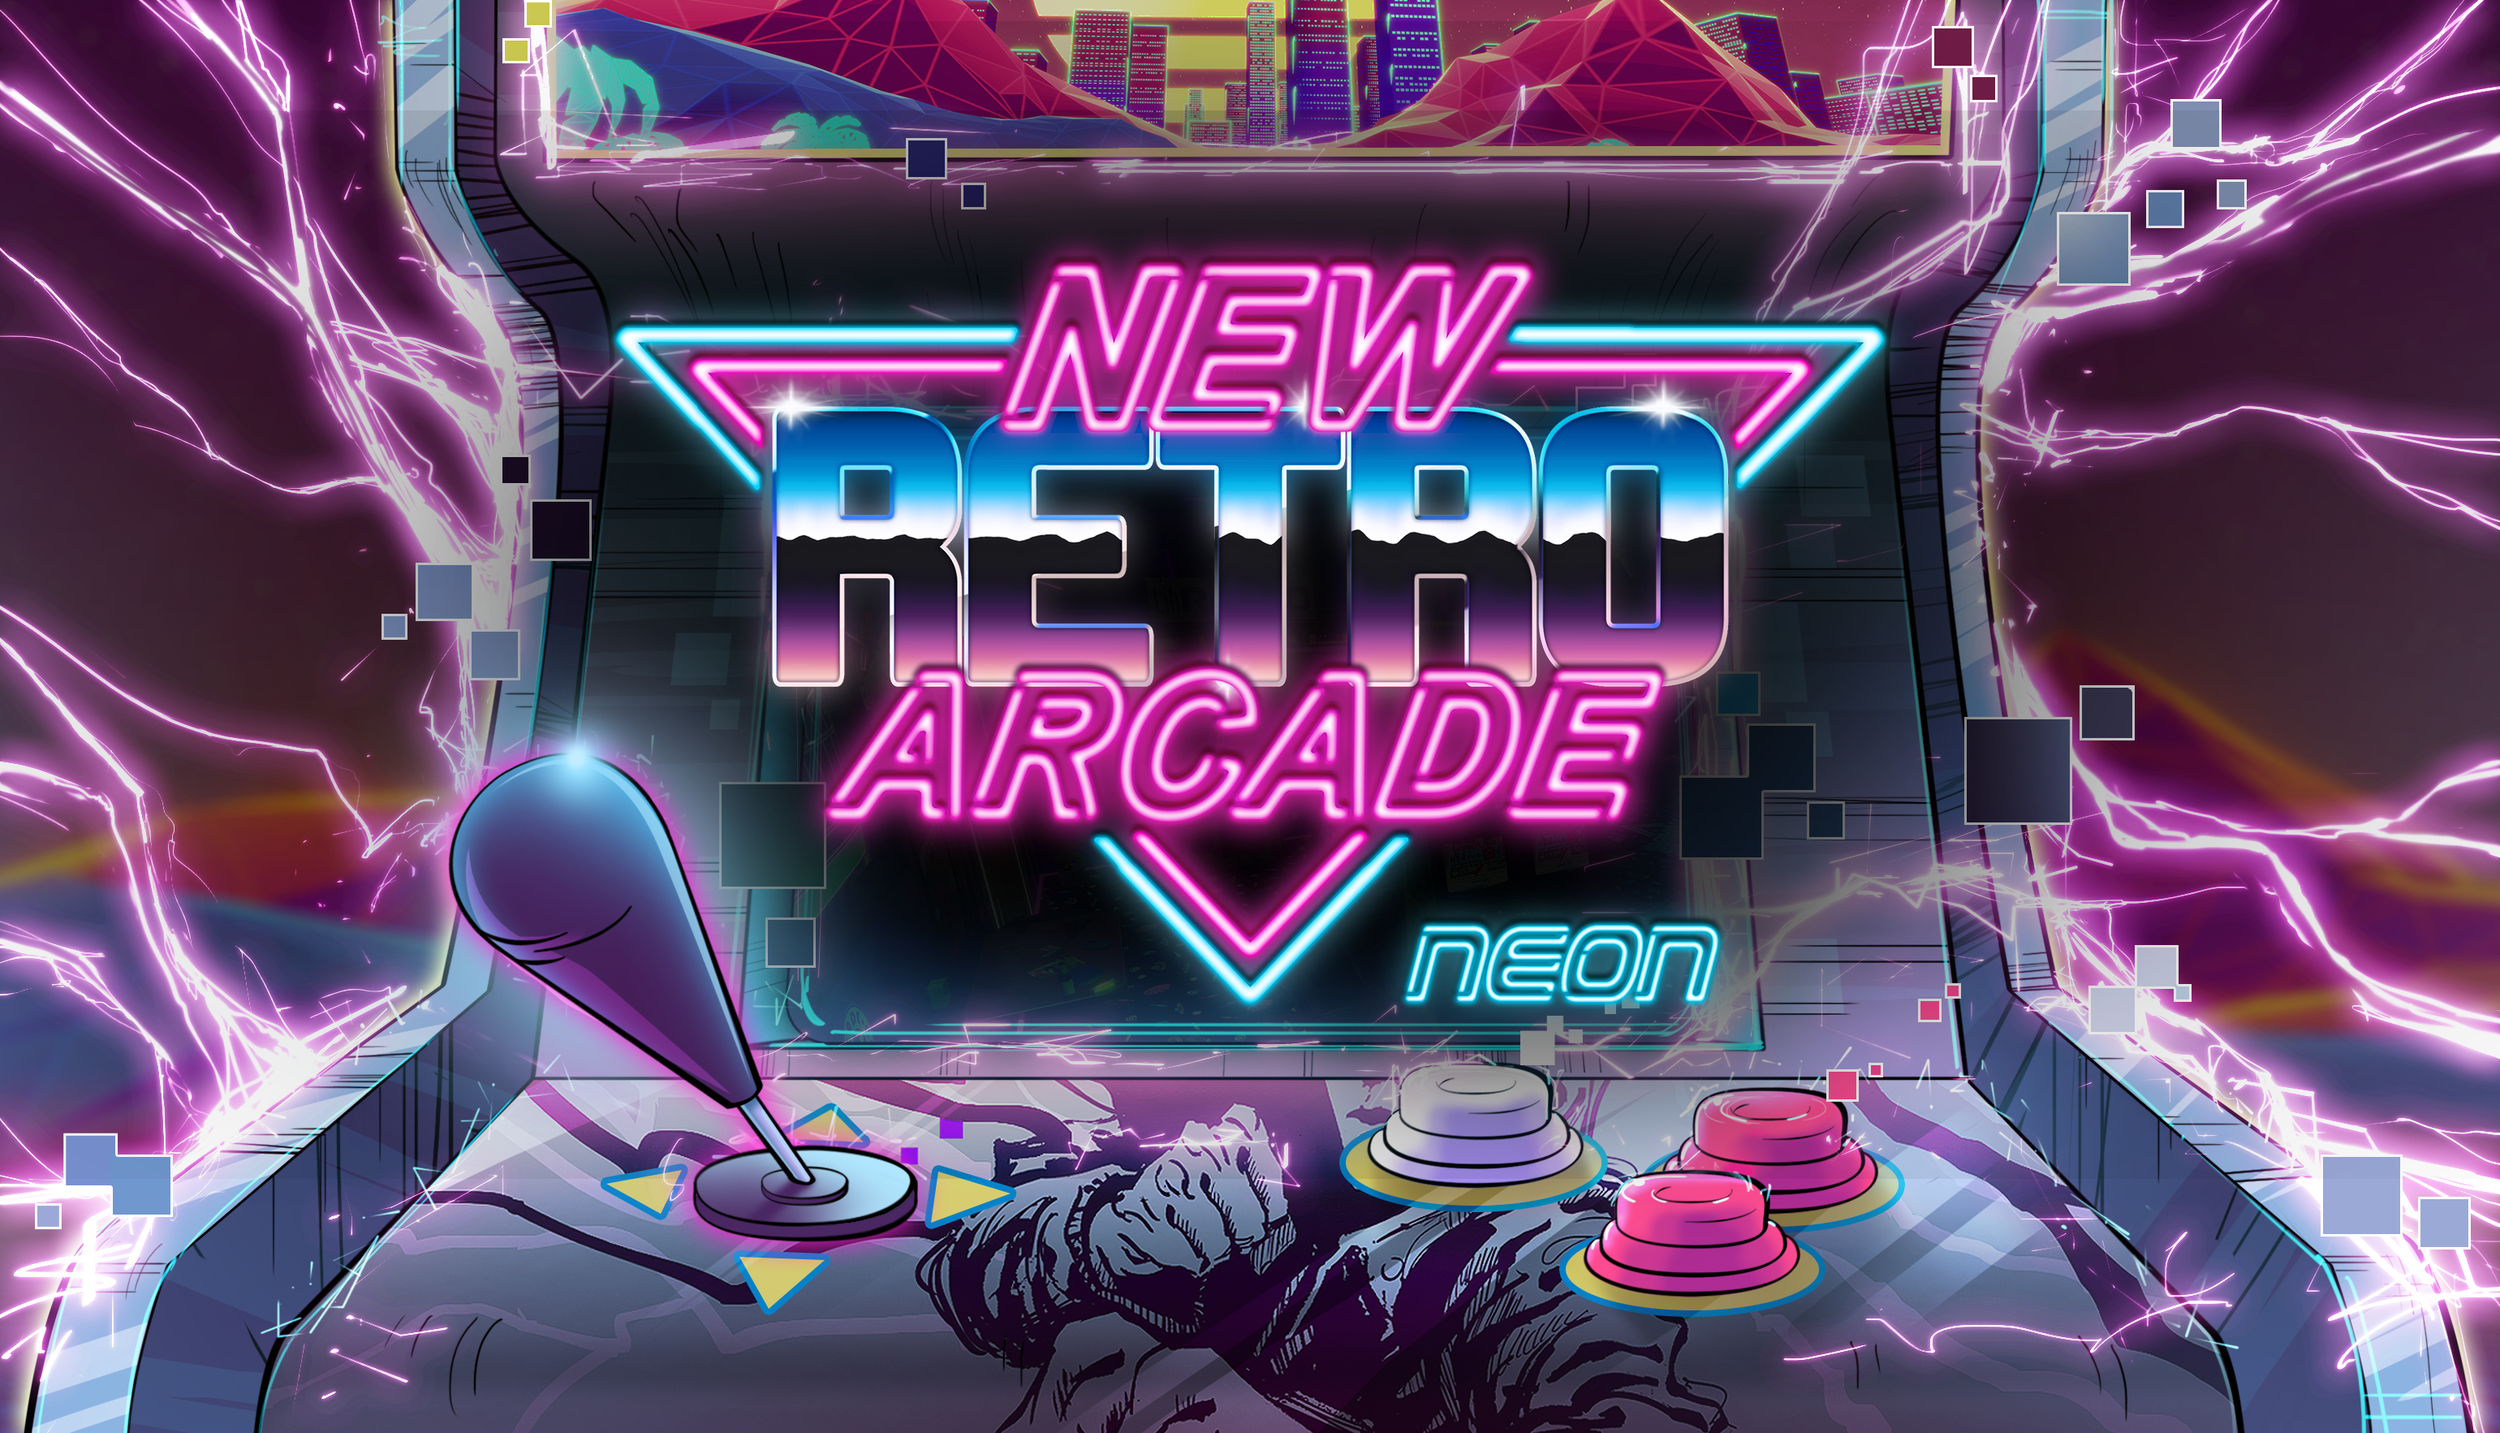 New Retro Arcade: Neon     2D/3D Artist